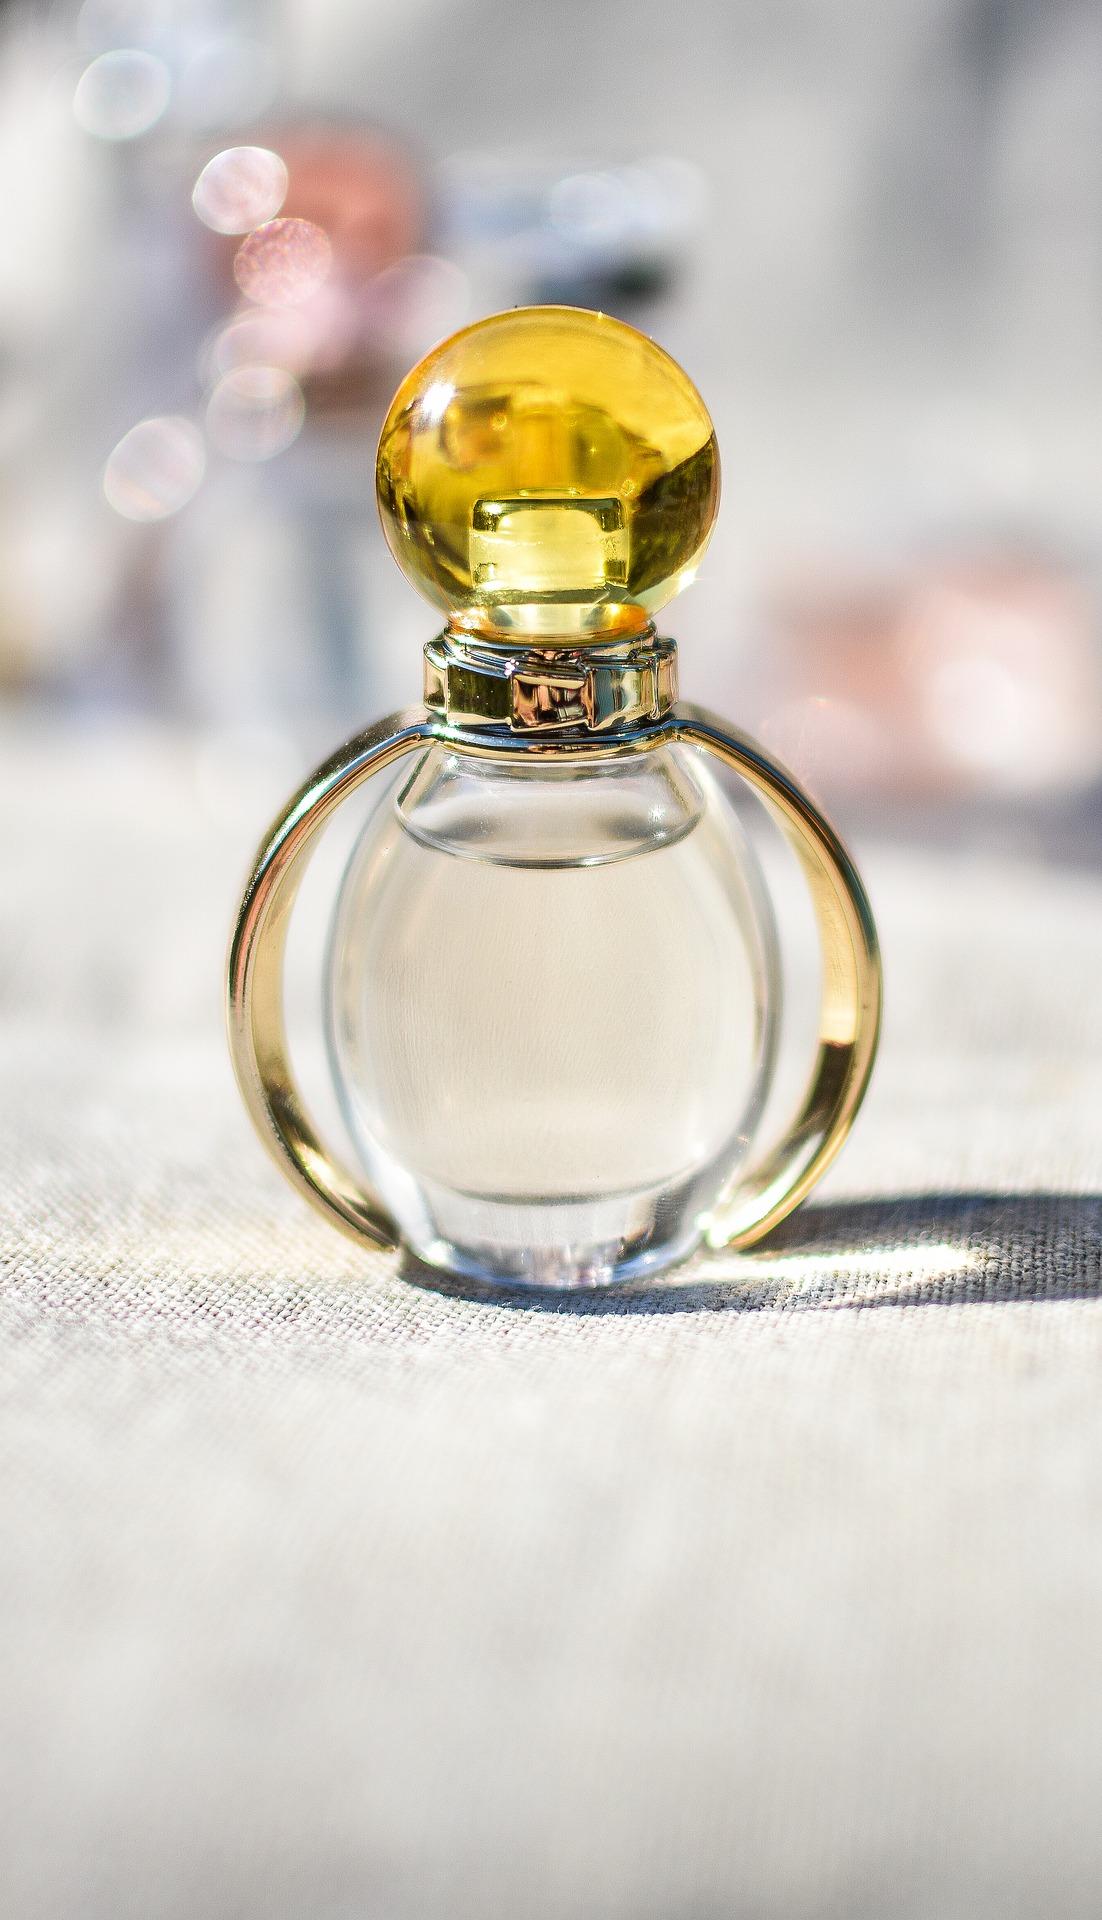 bottle-2387210_1920